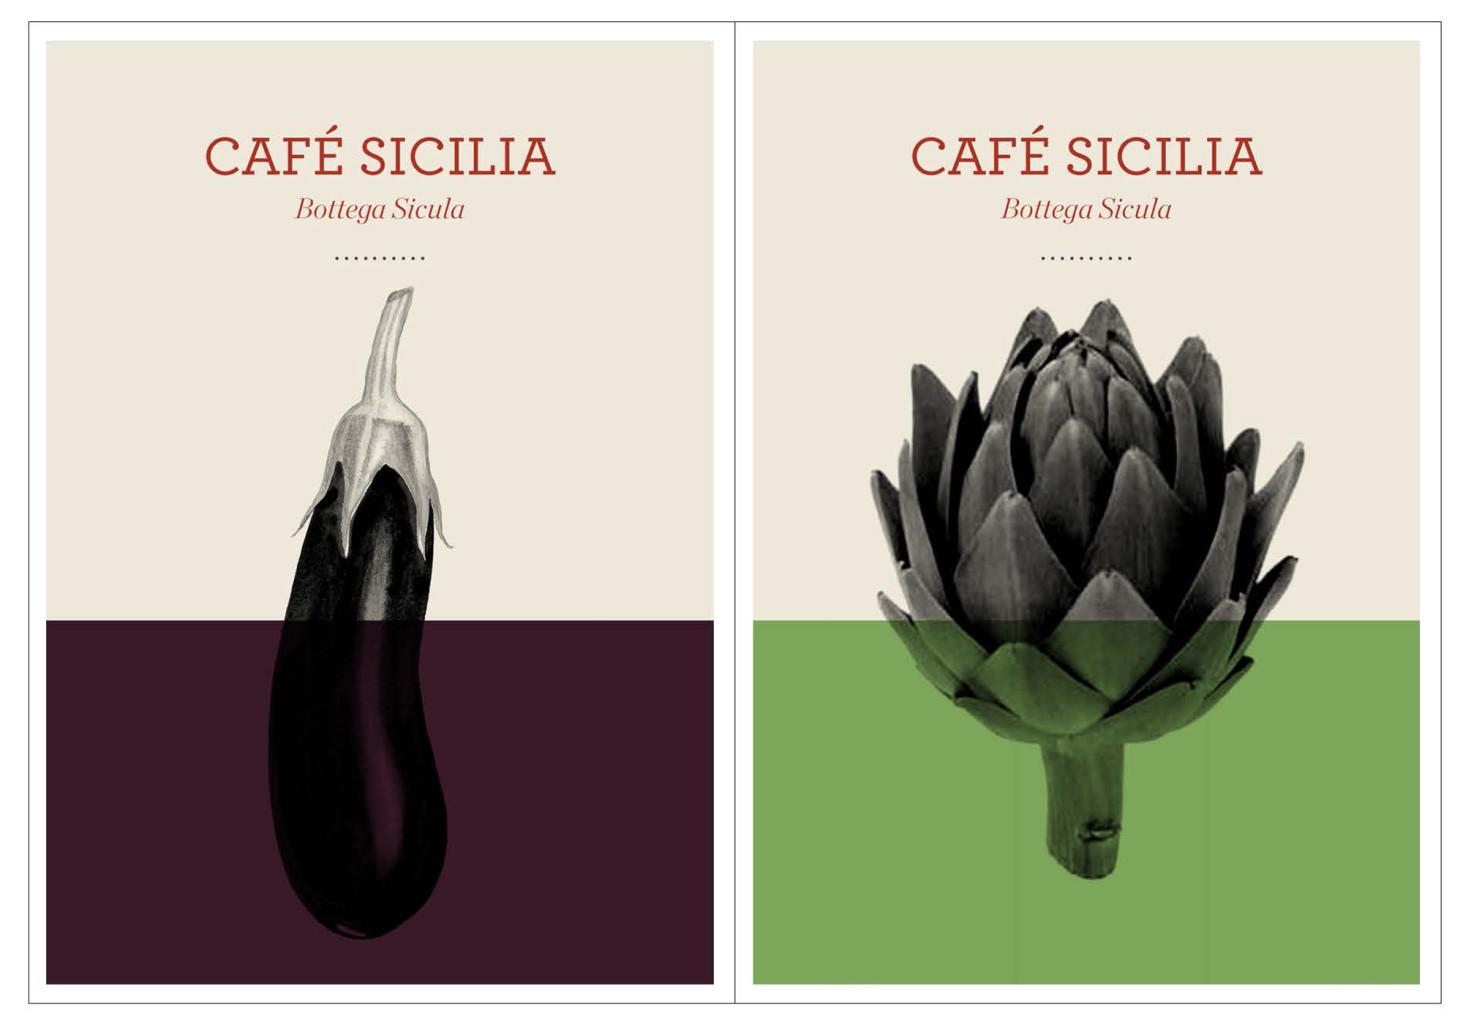 Cafe sicilia branding 4